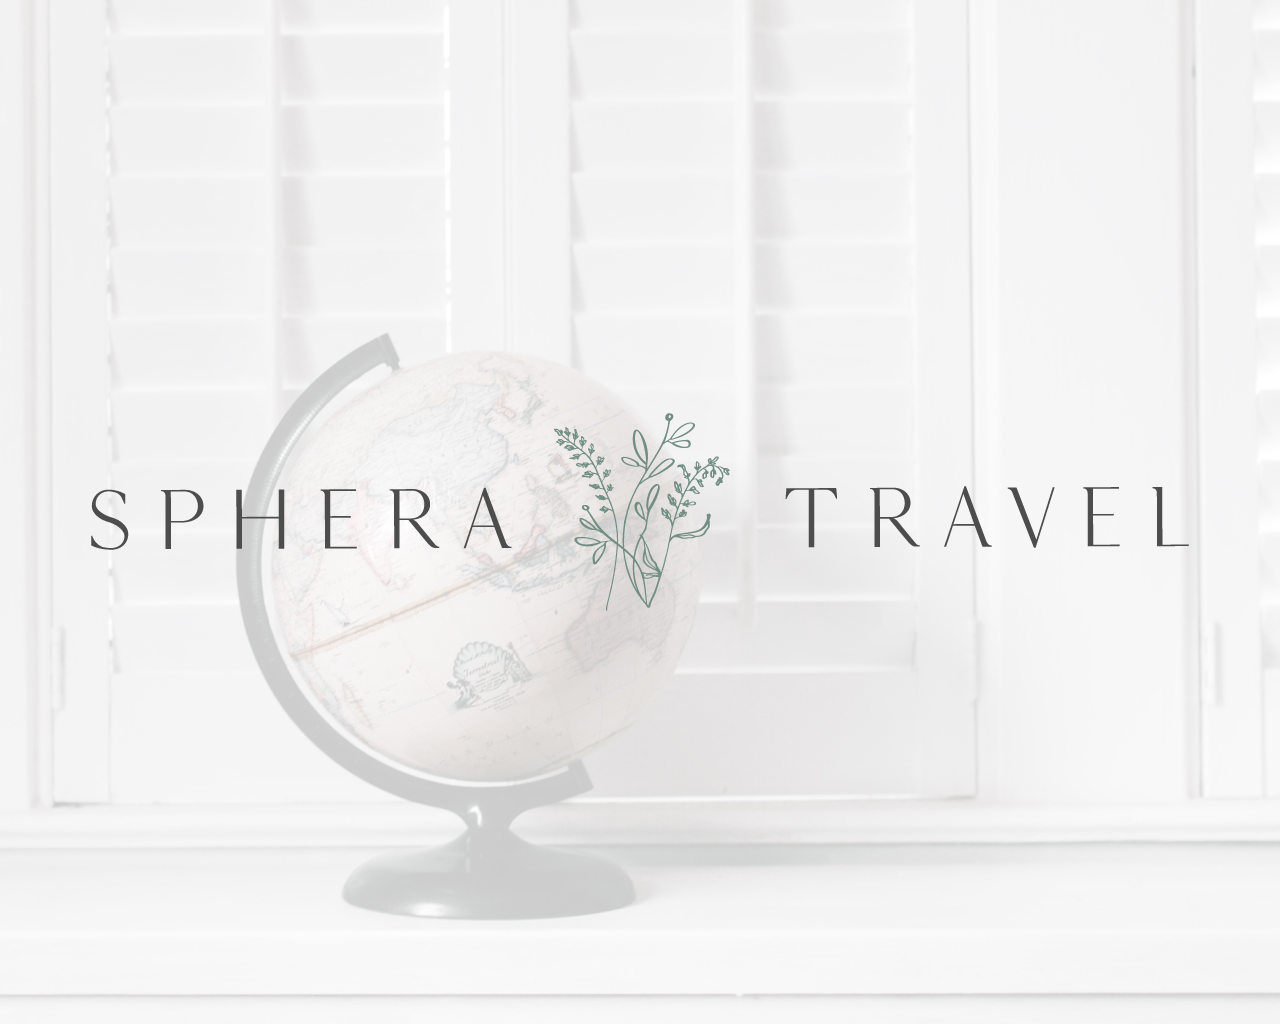 Sphera Travel Alternate Logo Design | Witt and Company